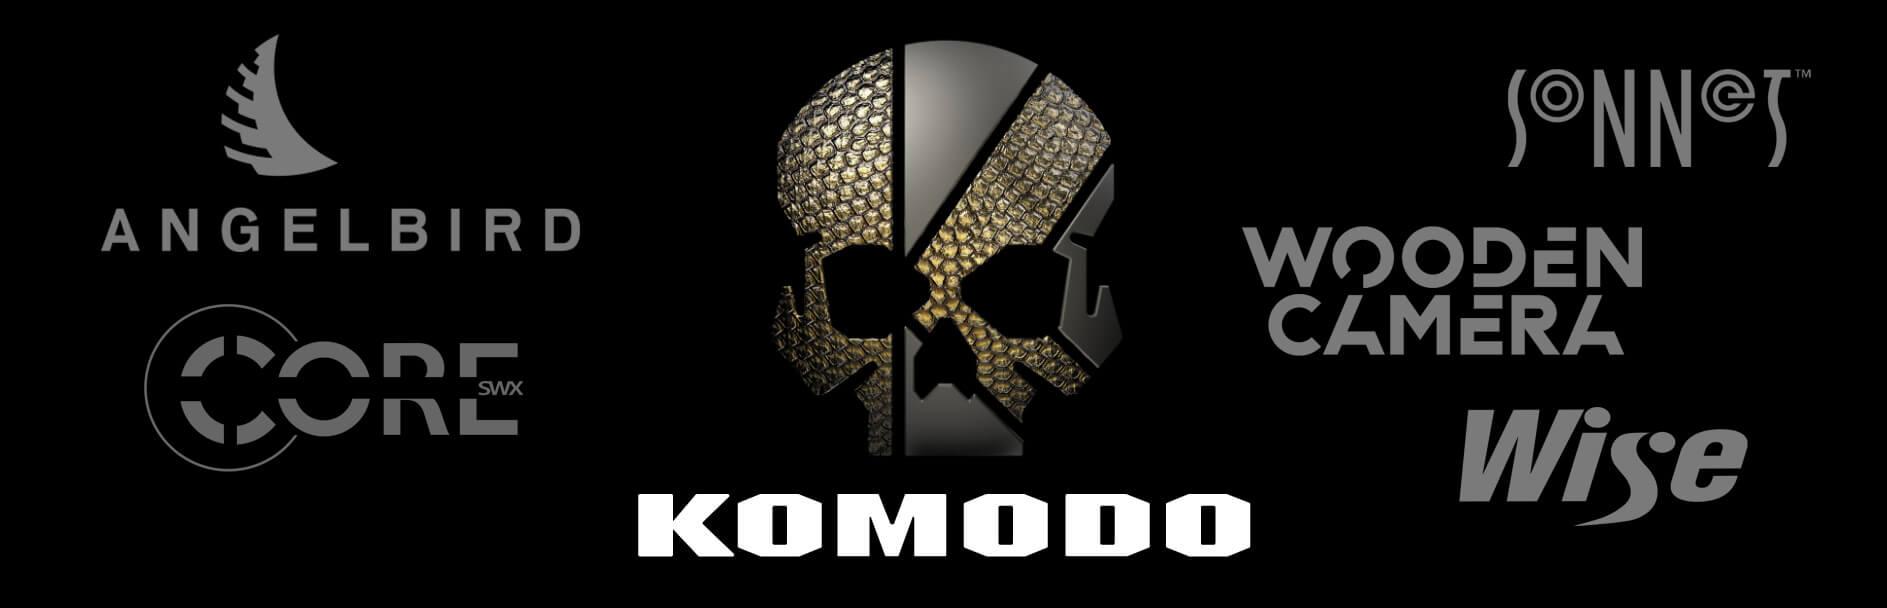 Rigging the Komodo